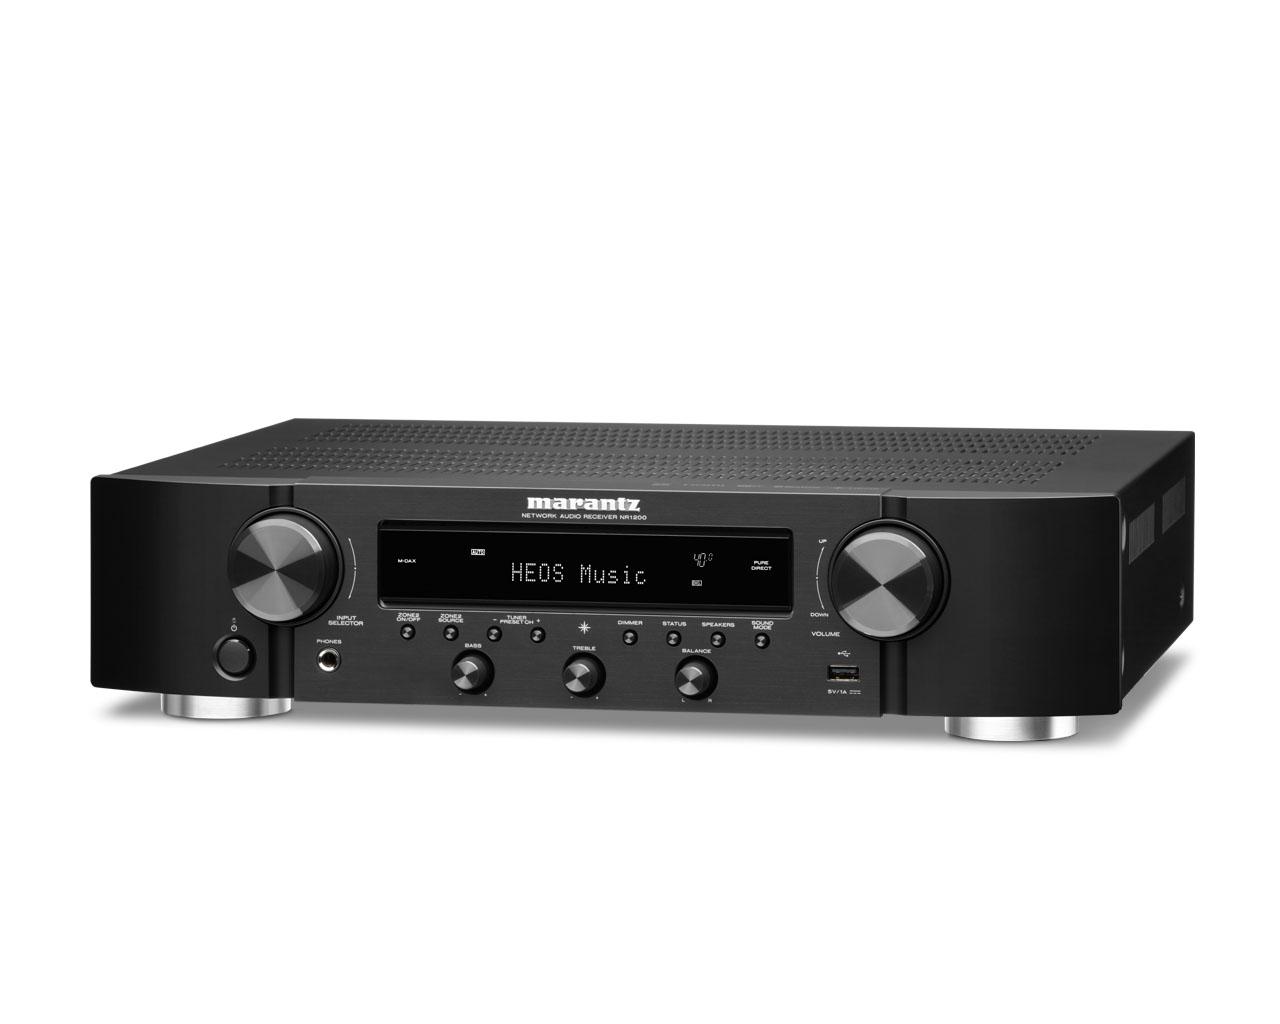 Marantz NR 1200 AV-Receiver compact Stereo-Netzwork-Receiver with HEOS